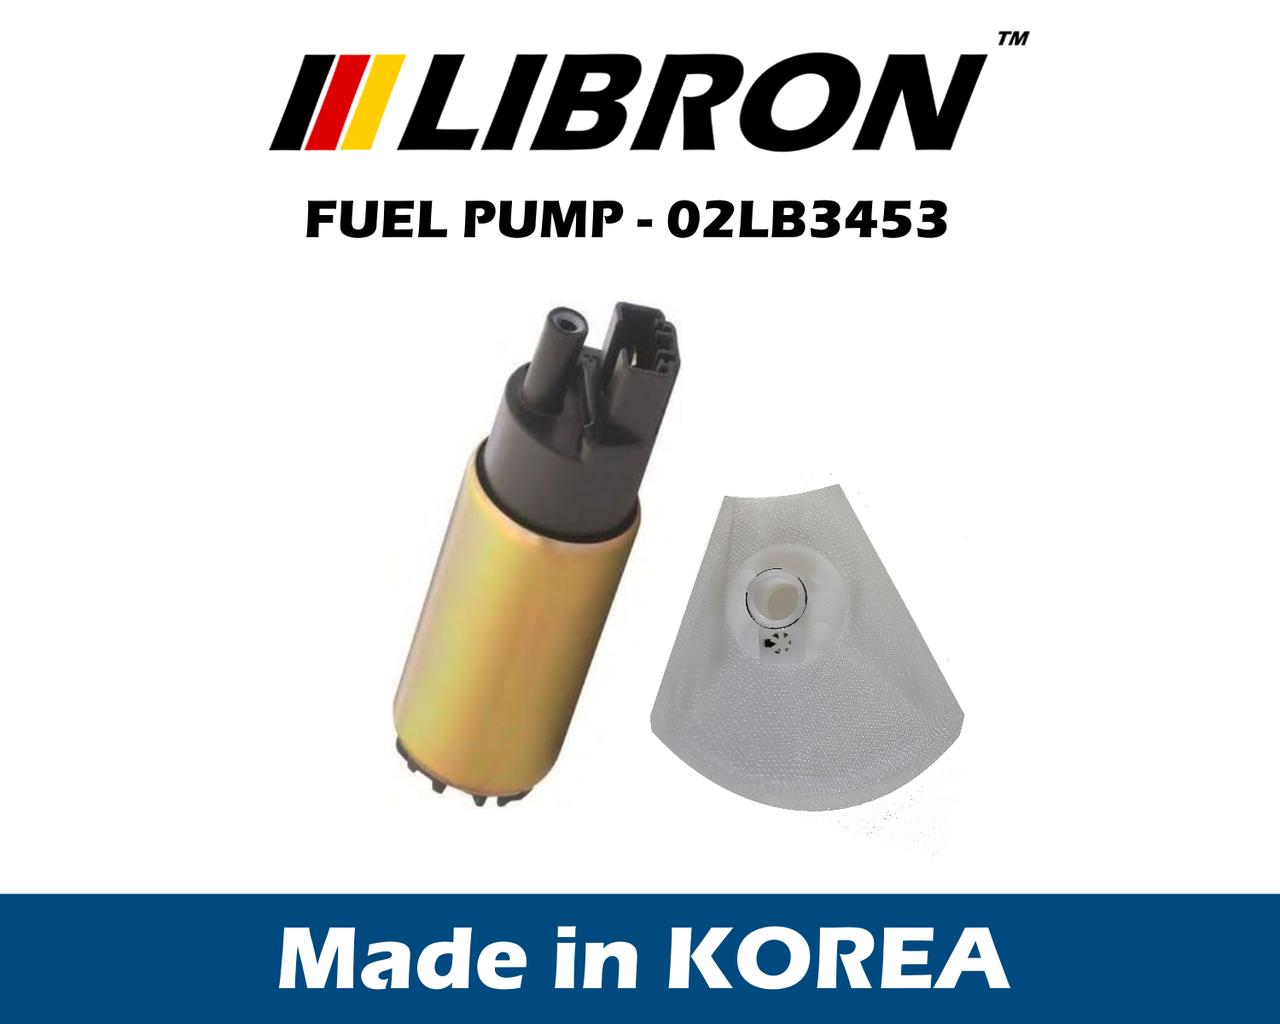 Бензонасос LIBRON 02LB3453 (аналог 0580453453 Bosch, MAM00006 Magneti Marelli) - Ваз Vaz